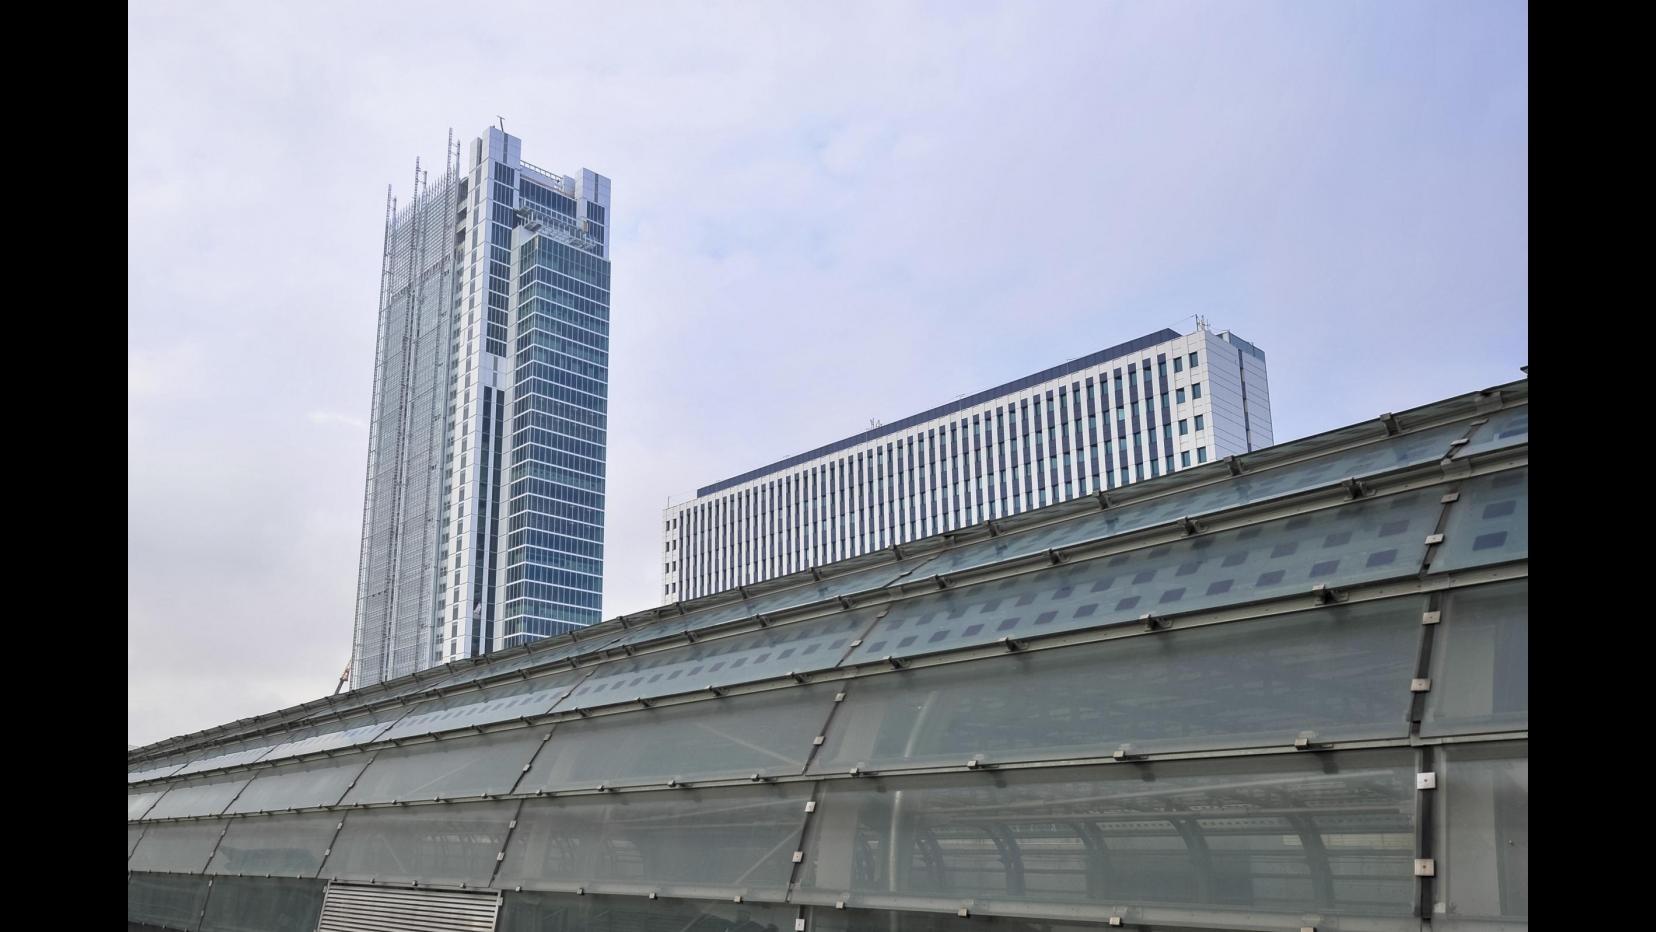 Intesa Sp, al via nuova banca commerciale e d'investimento in Brasile